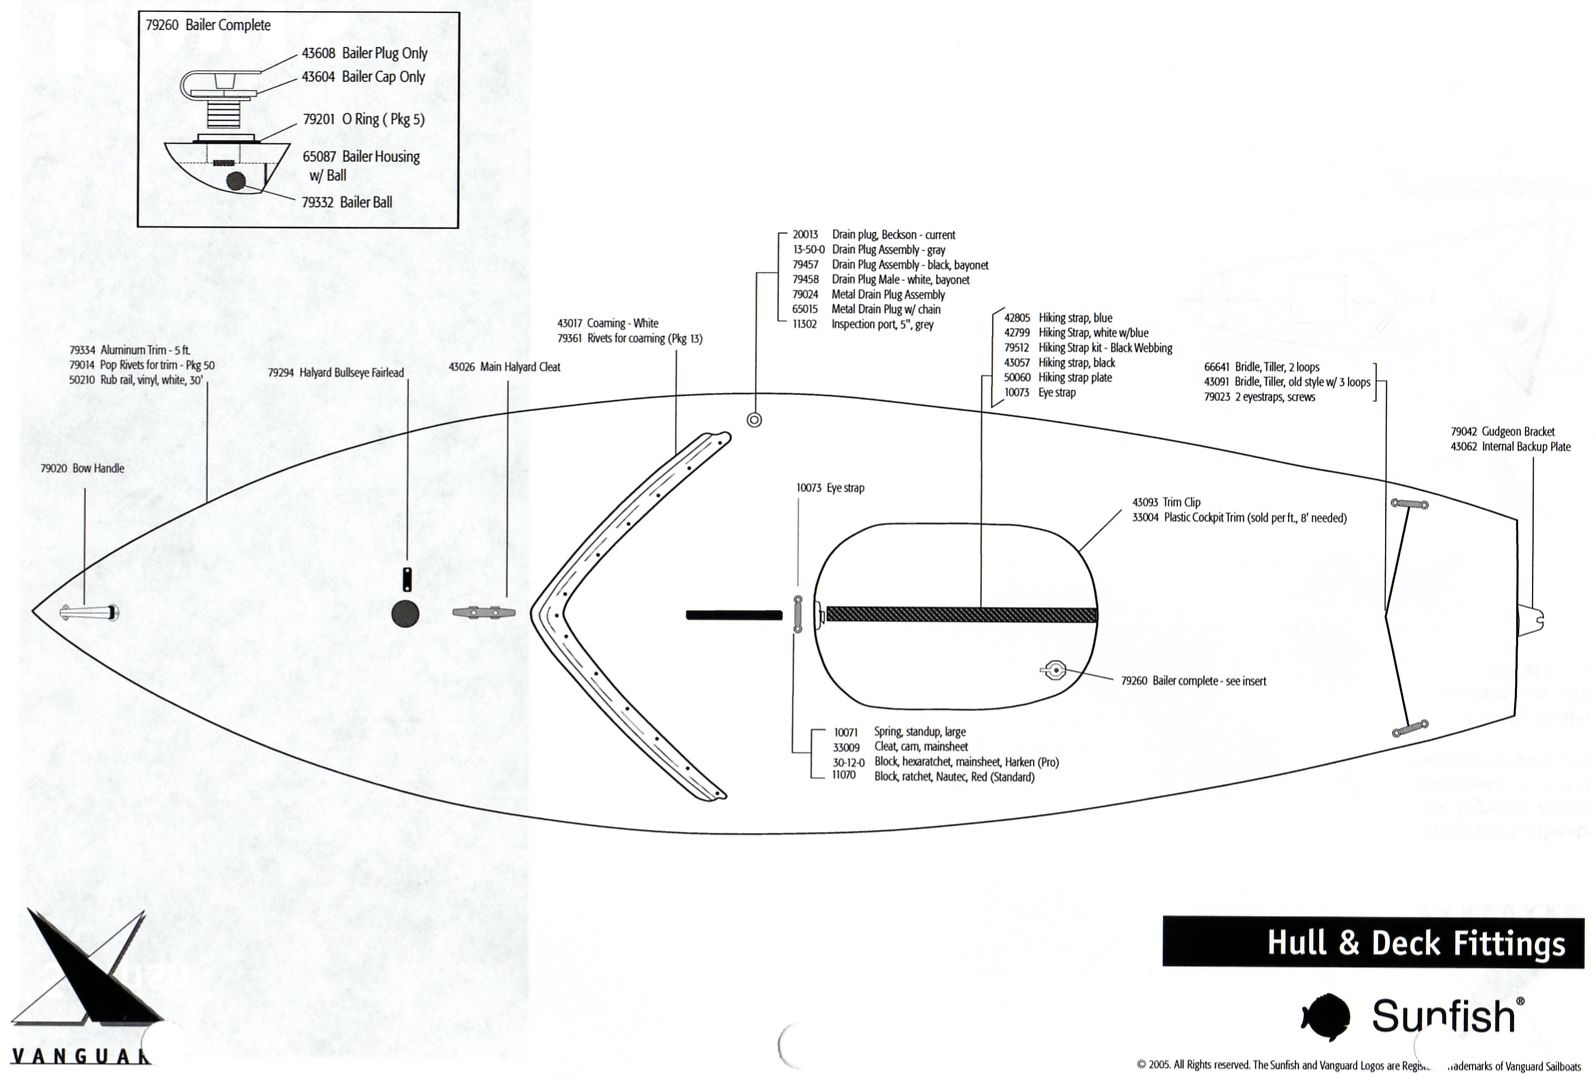 sunfish parts diagram | Sunfish in 2019 | Boat parts, Boat